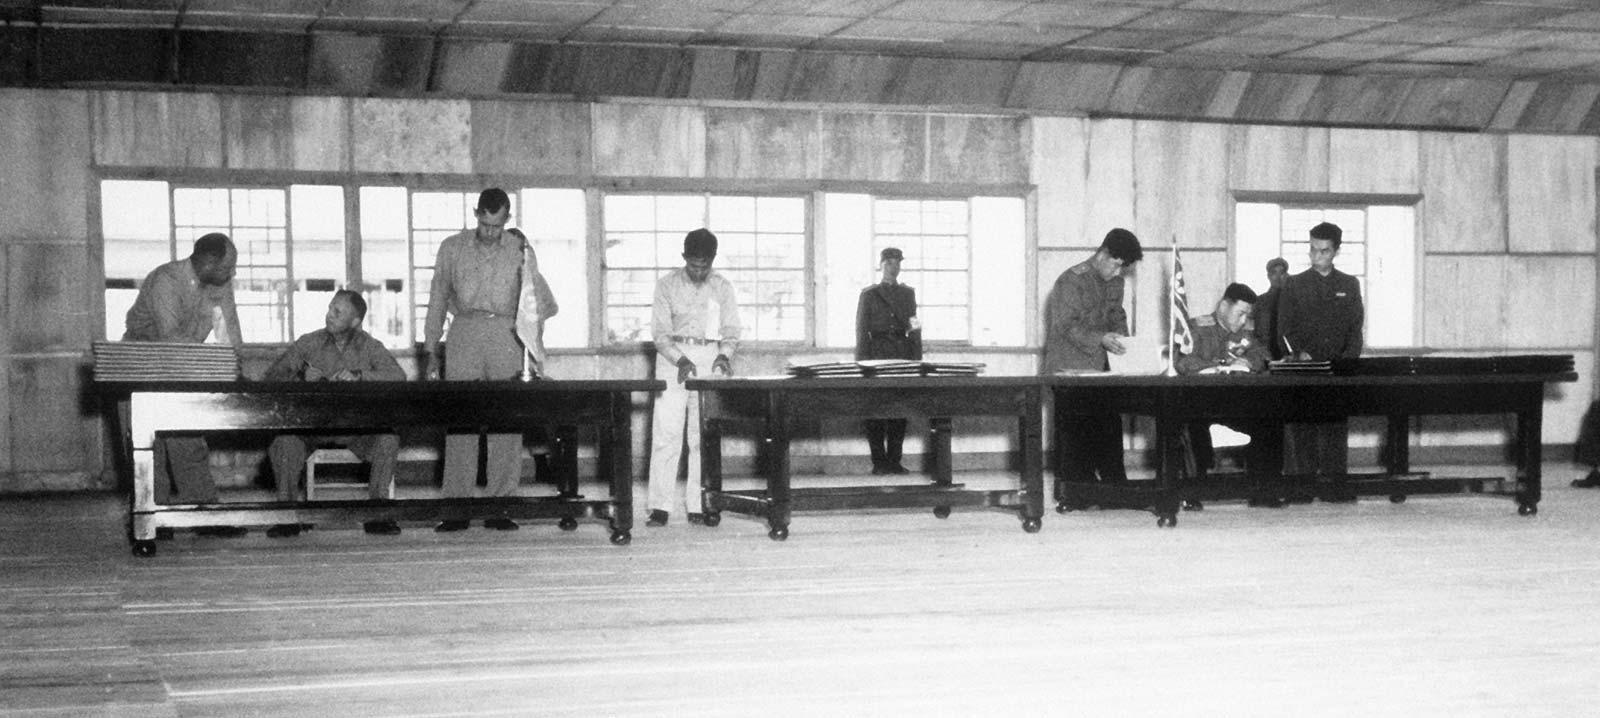 Armistice agreement - July 27, 1953